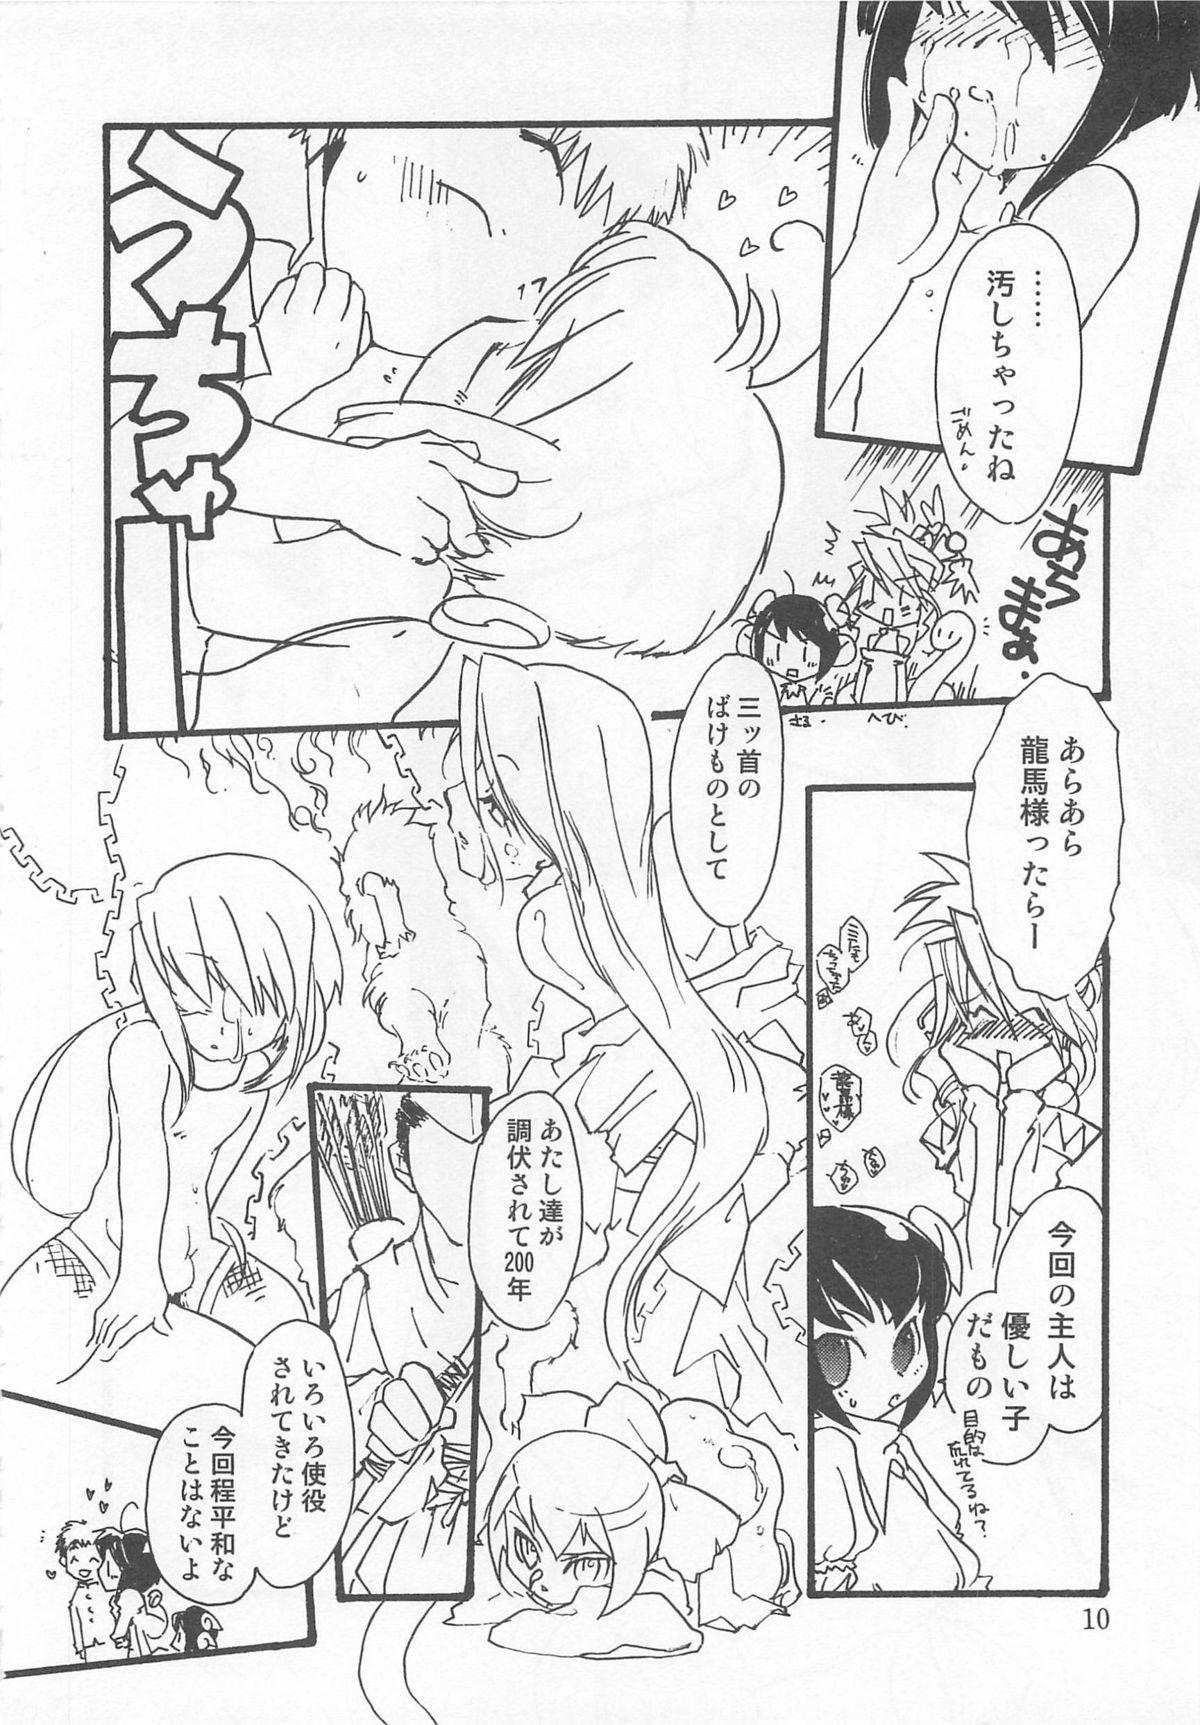 Otokonoko HEAVEN Vol. 02 Dokidoki Chikan Taiken 12